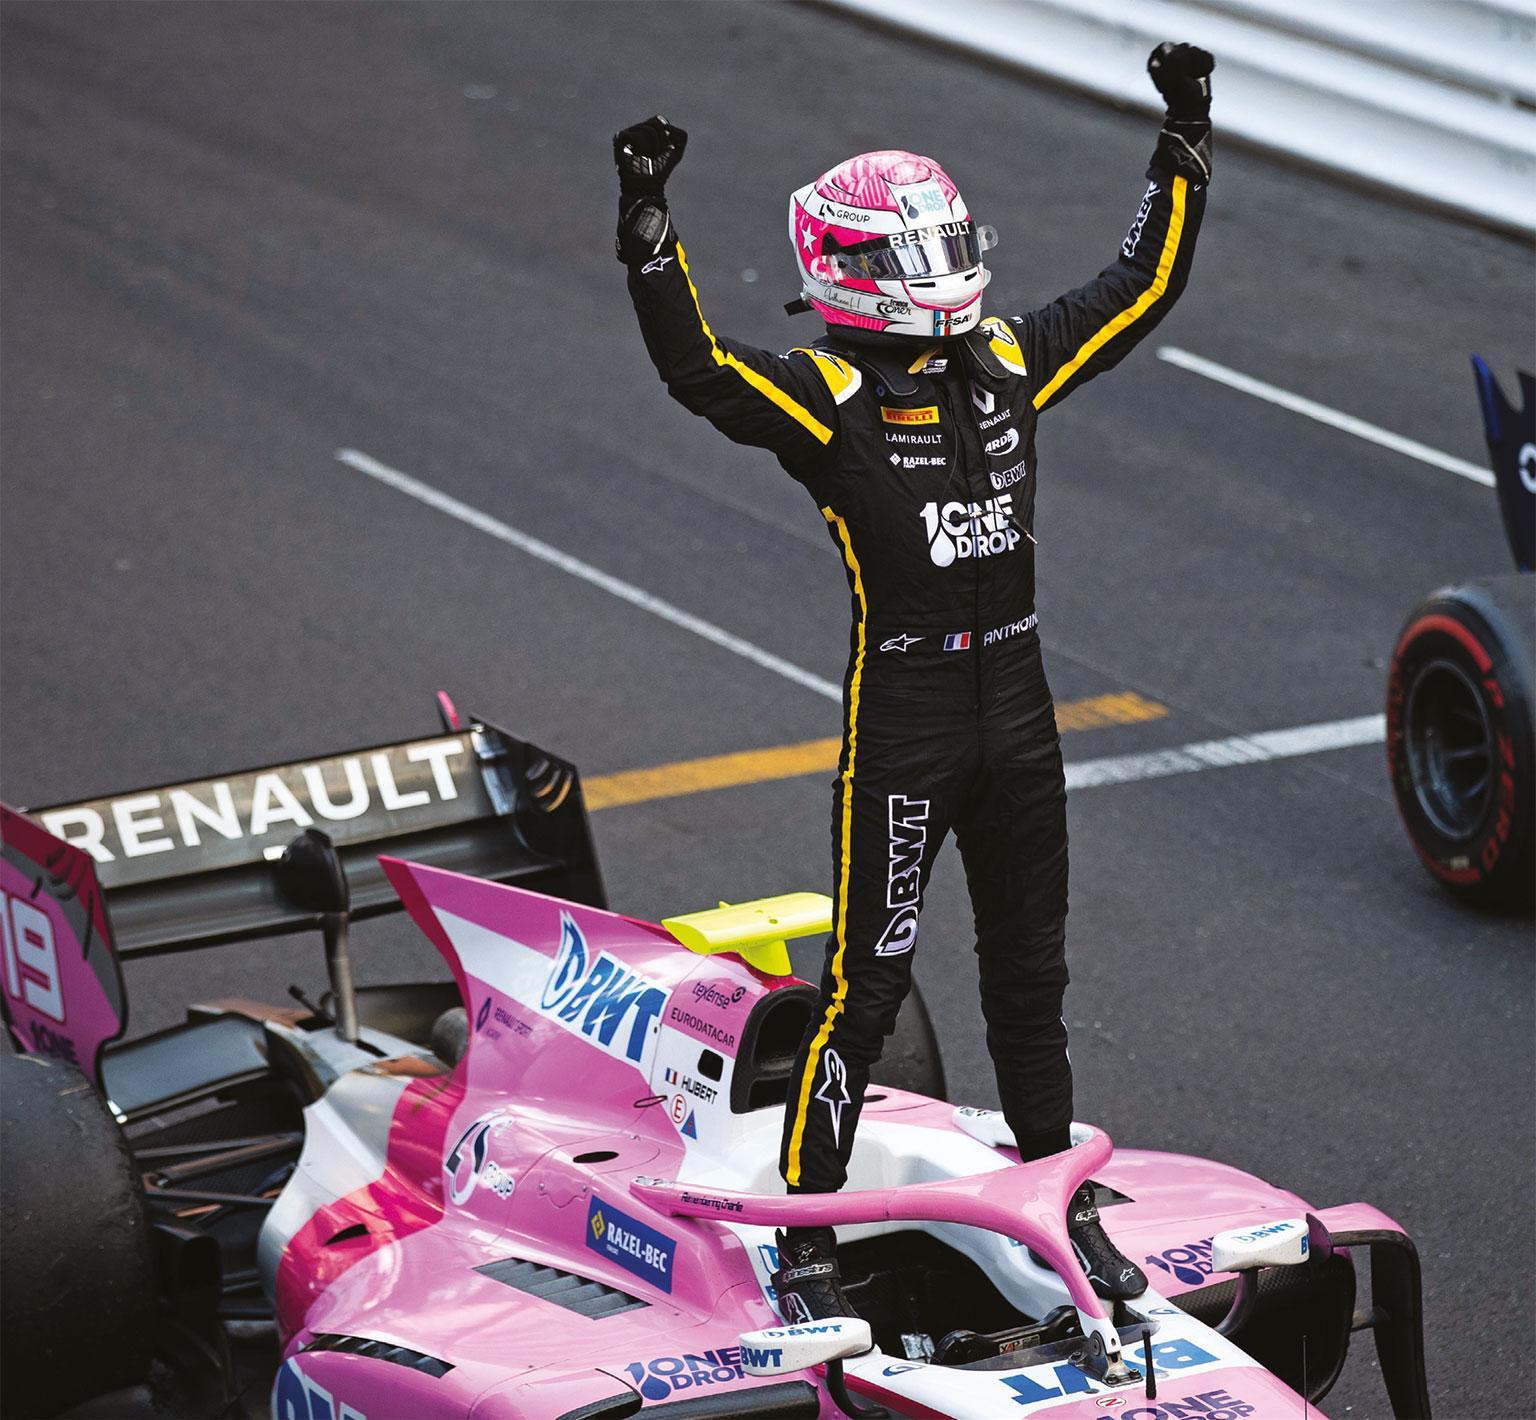 Anthoine Hubert celebrates during the Monaco FIA Formula 2 round in May 2019